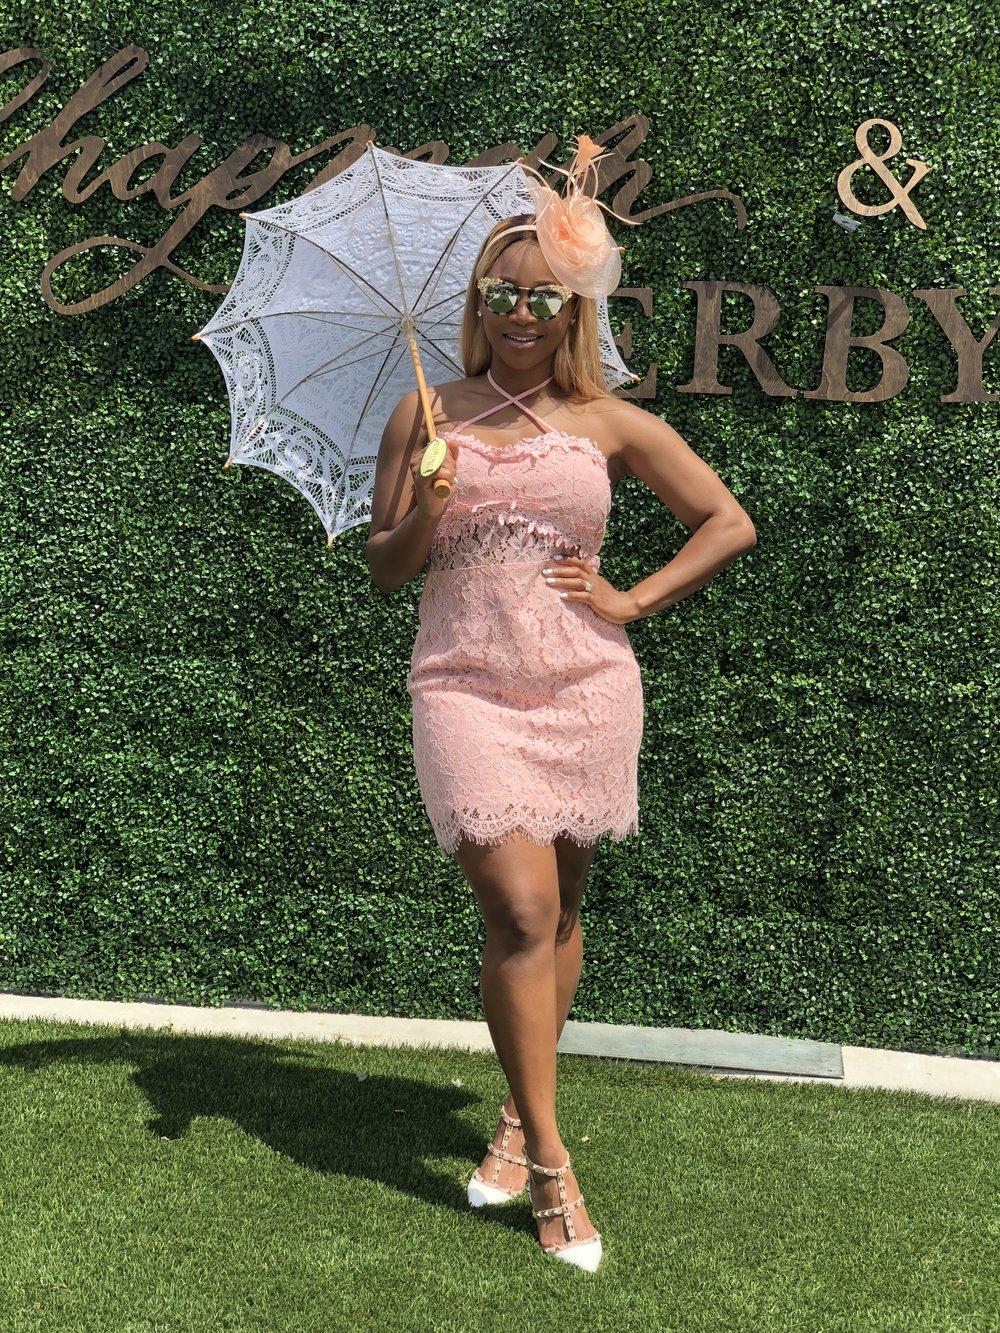 Dress can be found  http://us.boohoo.com/boutique-fez-crochet-trim-lace-bodycon-dress/DZZ57000-158-22.html  Shoes: Rockstud Valentino  Sunglasses: Unicorn eyewear